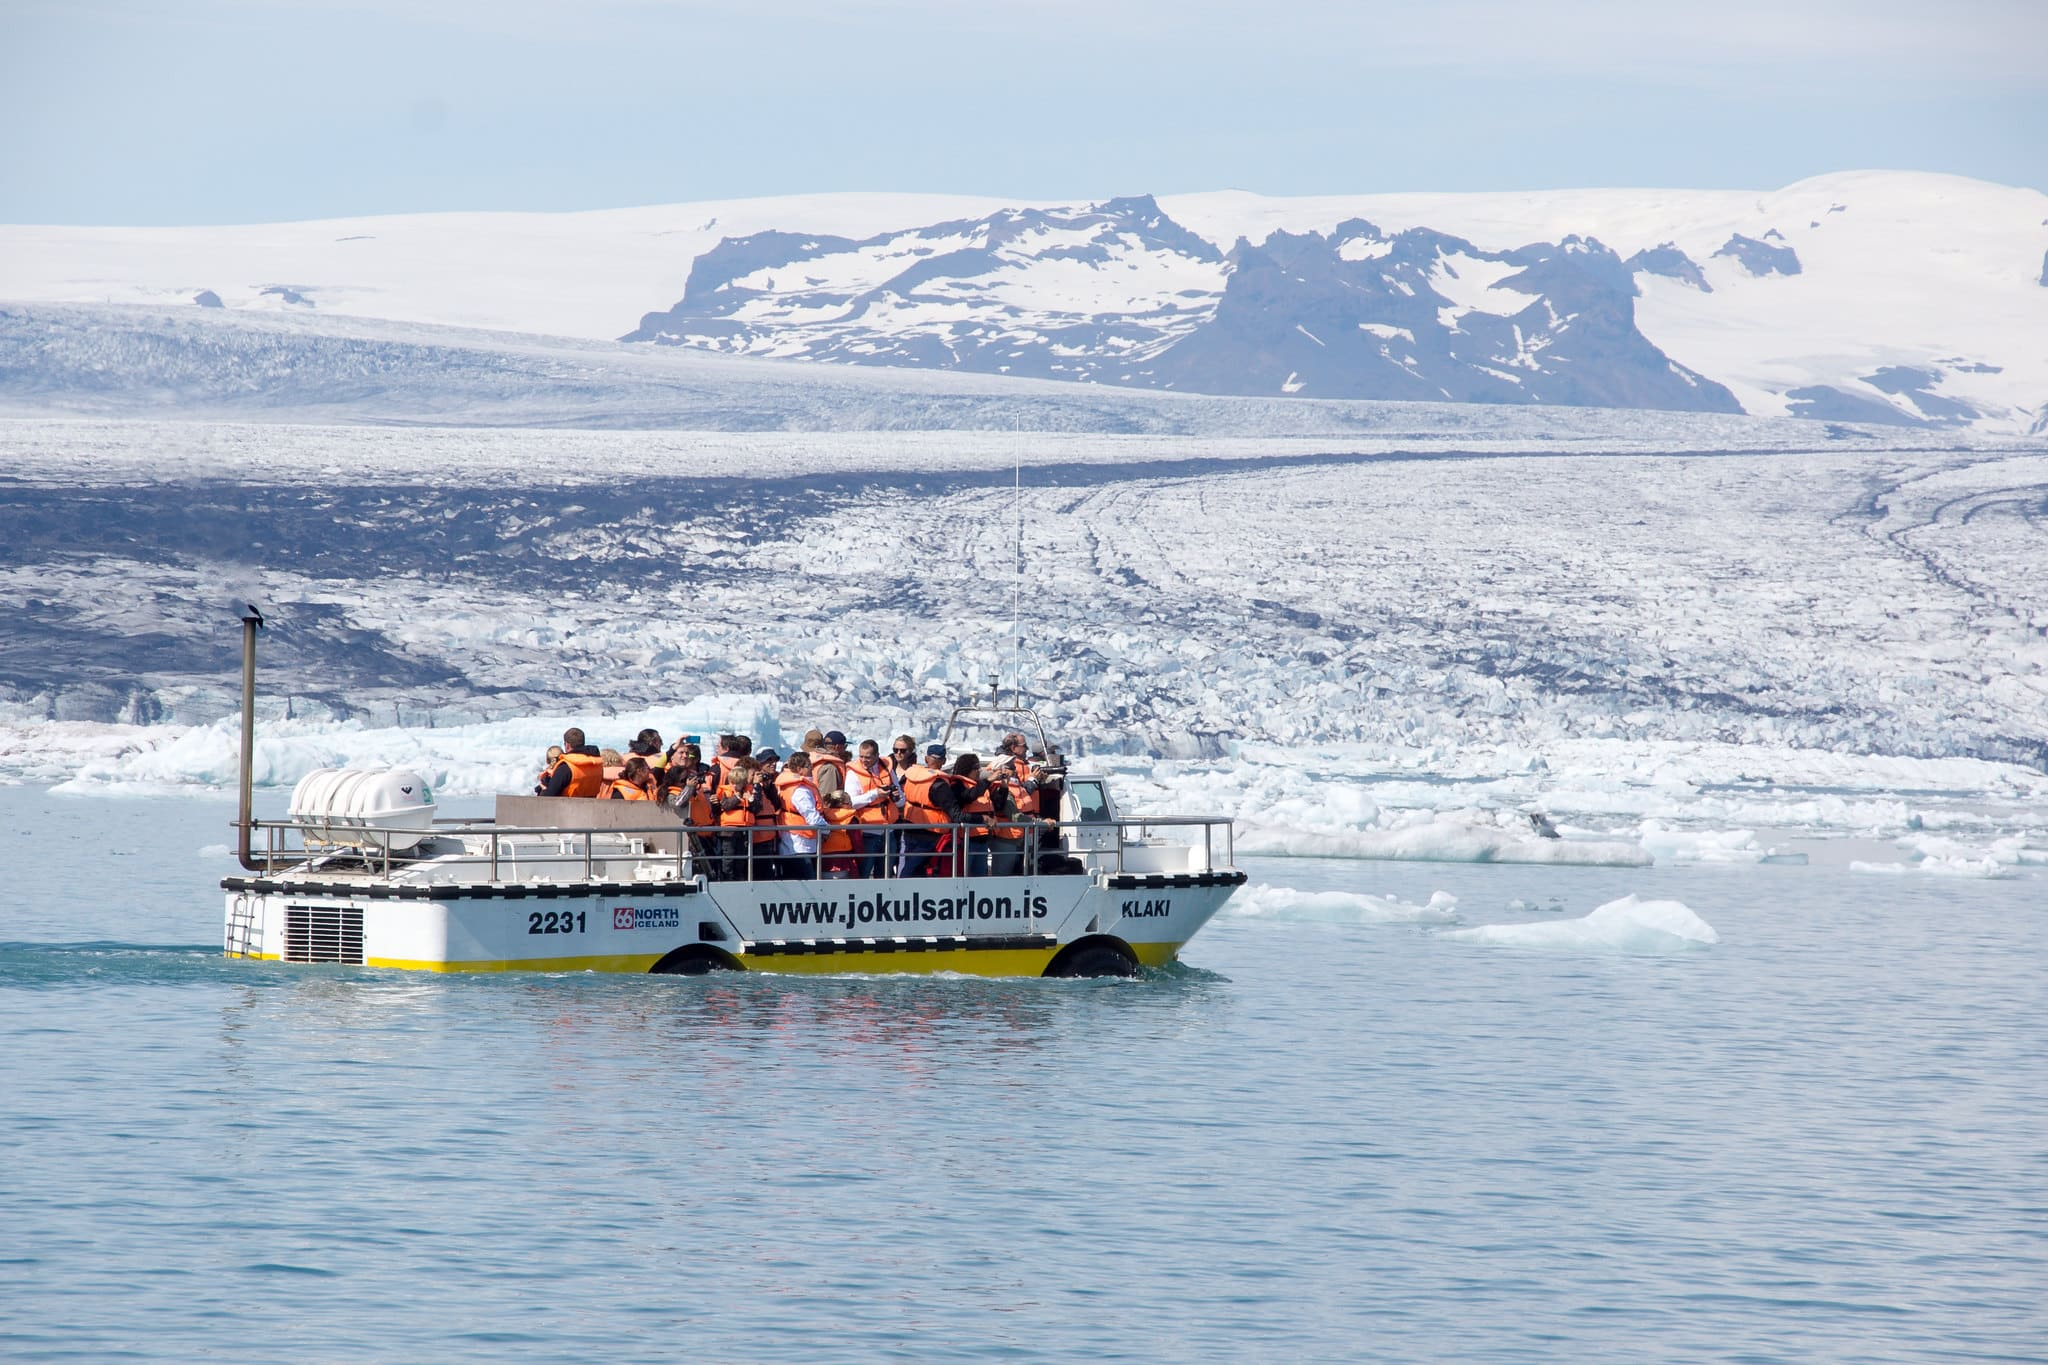 Amphibian Boat Tour on Jokulsarlon